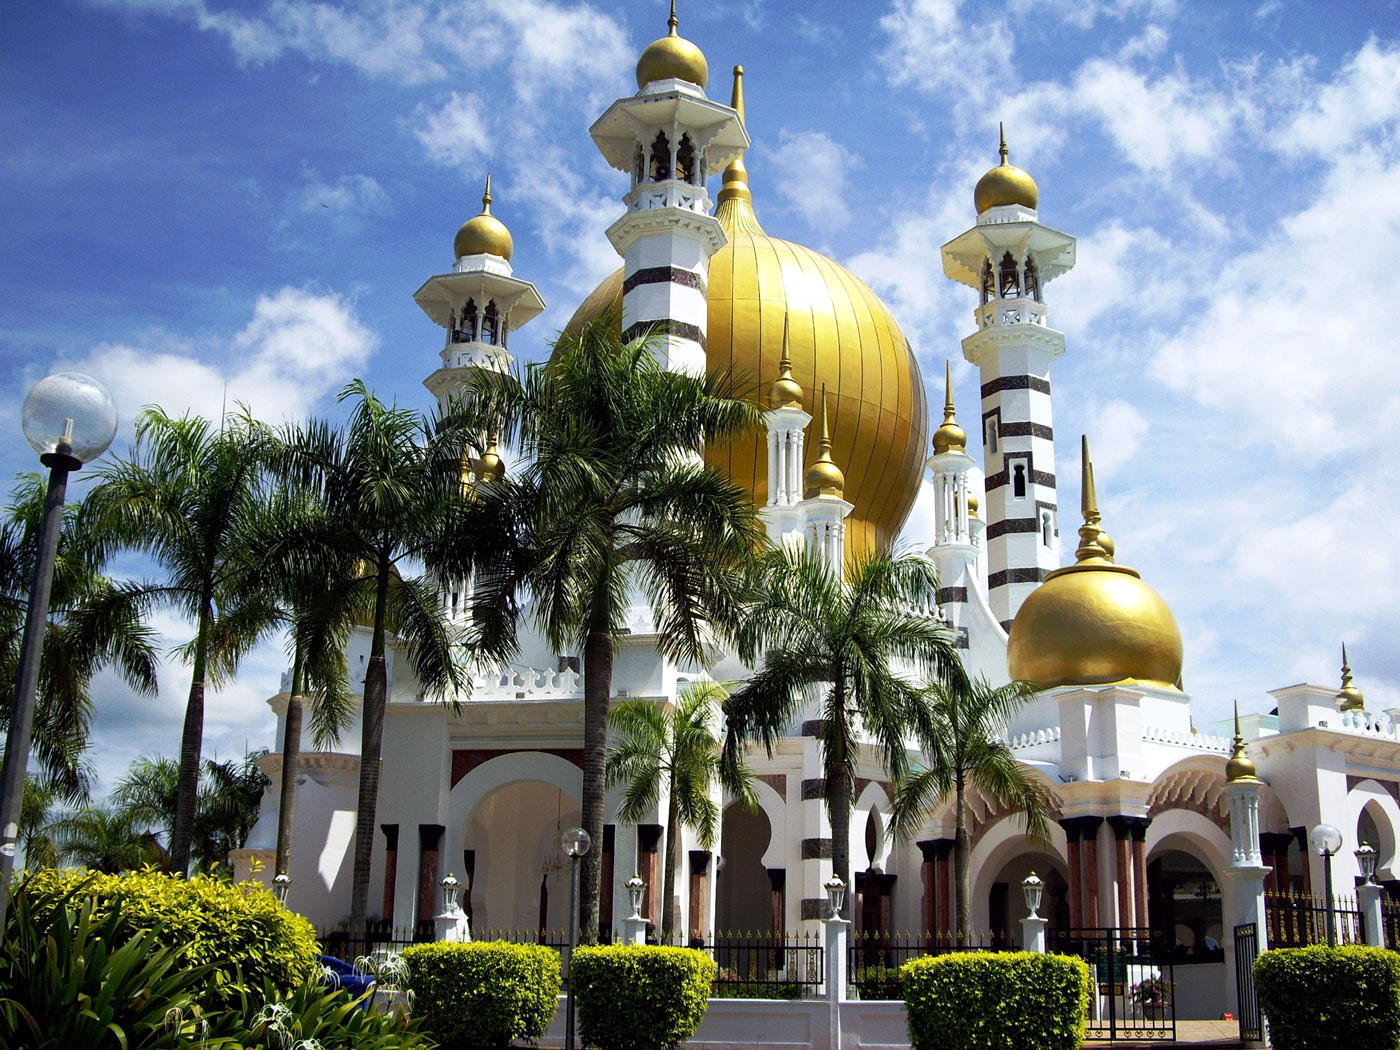 Kuala Kangsar Malaysia  City new picture : ubudiah moschee ort kuala kangsar malaysia auf der karte jahr 1917 ...